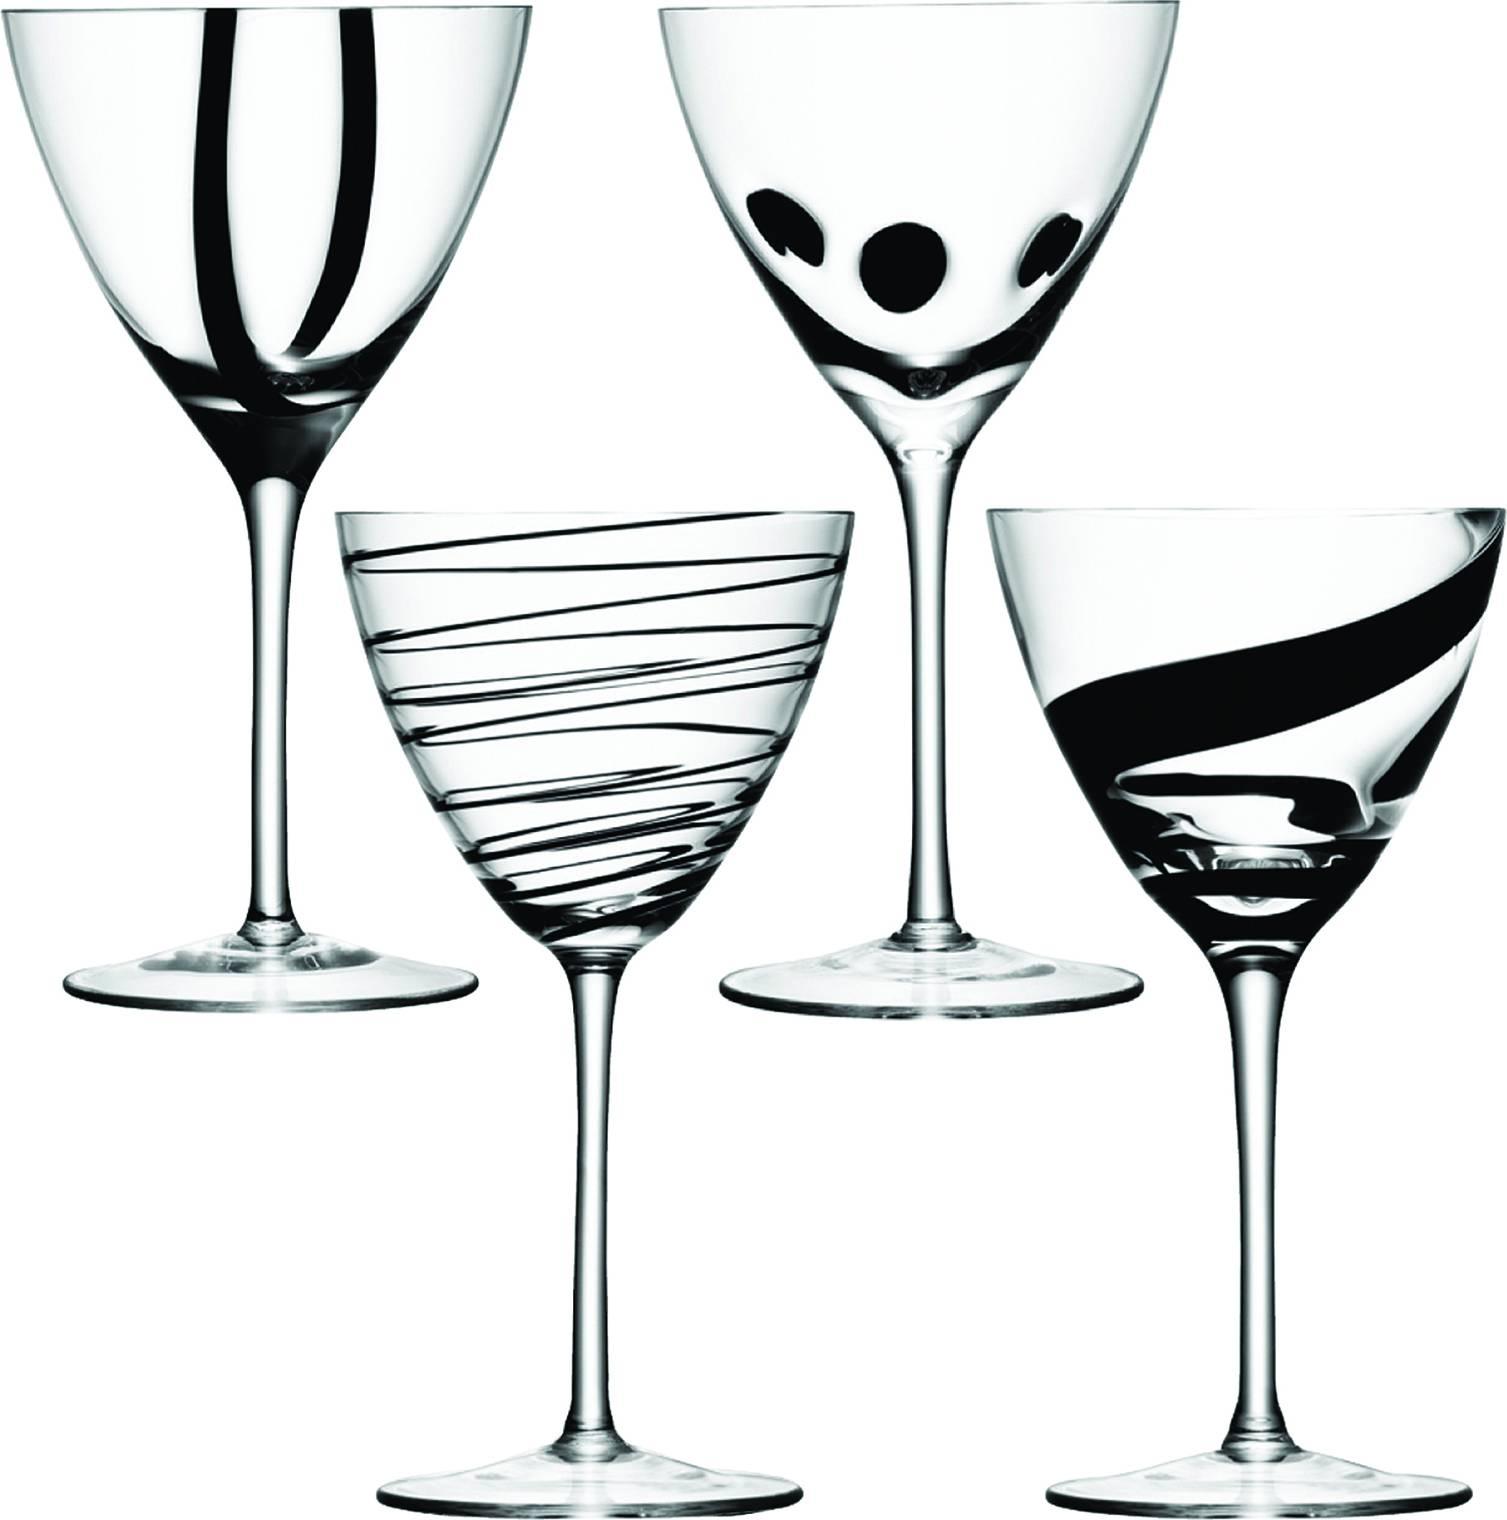 LSA JAZZ sklenice na víno, 400 ml, 4 ks, čirá/černá, Handmade G921-12-987 LSA International